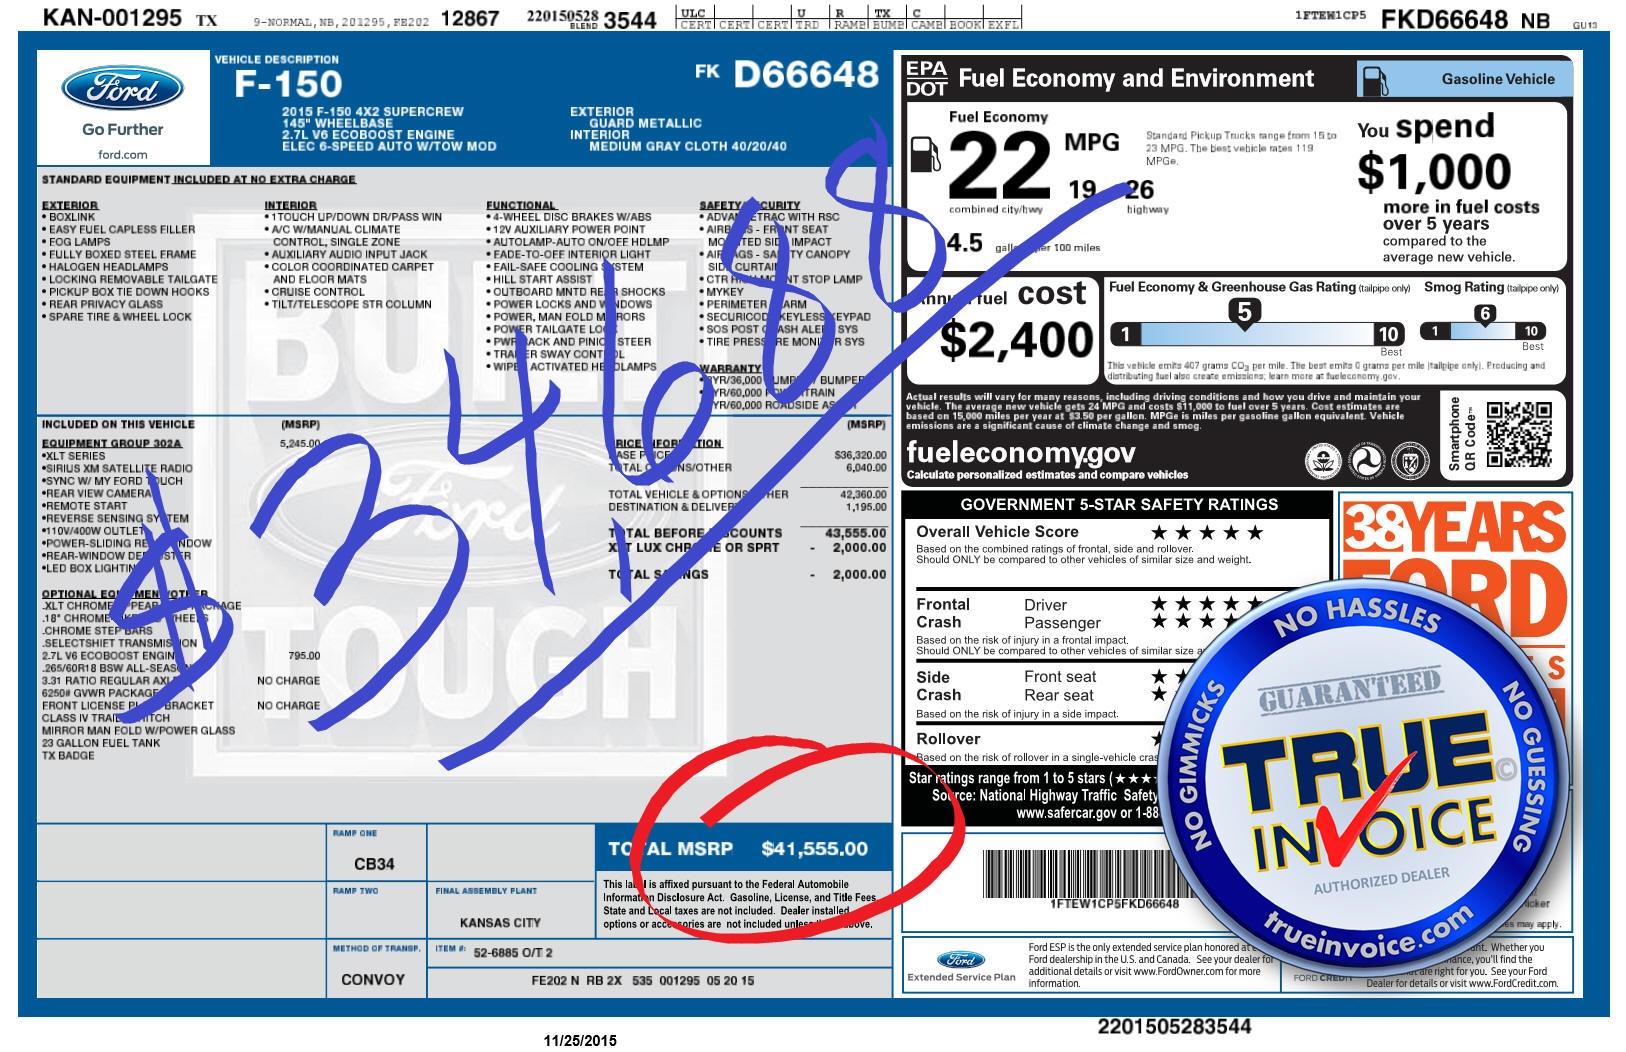 true invoice 2016 ford f150 vw invoice pricing